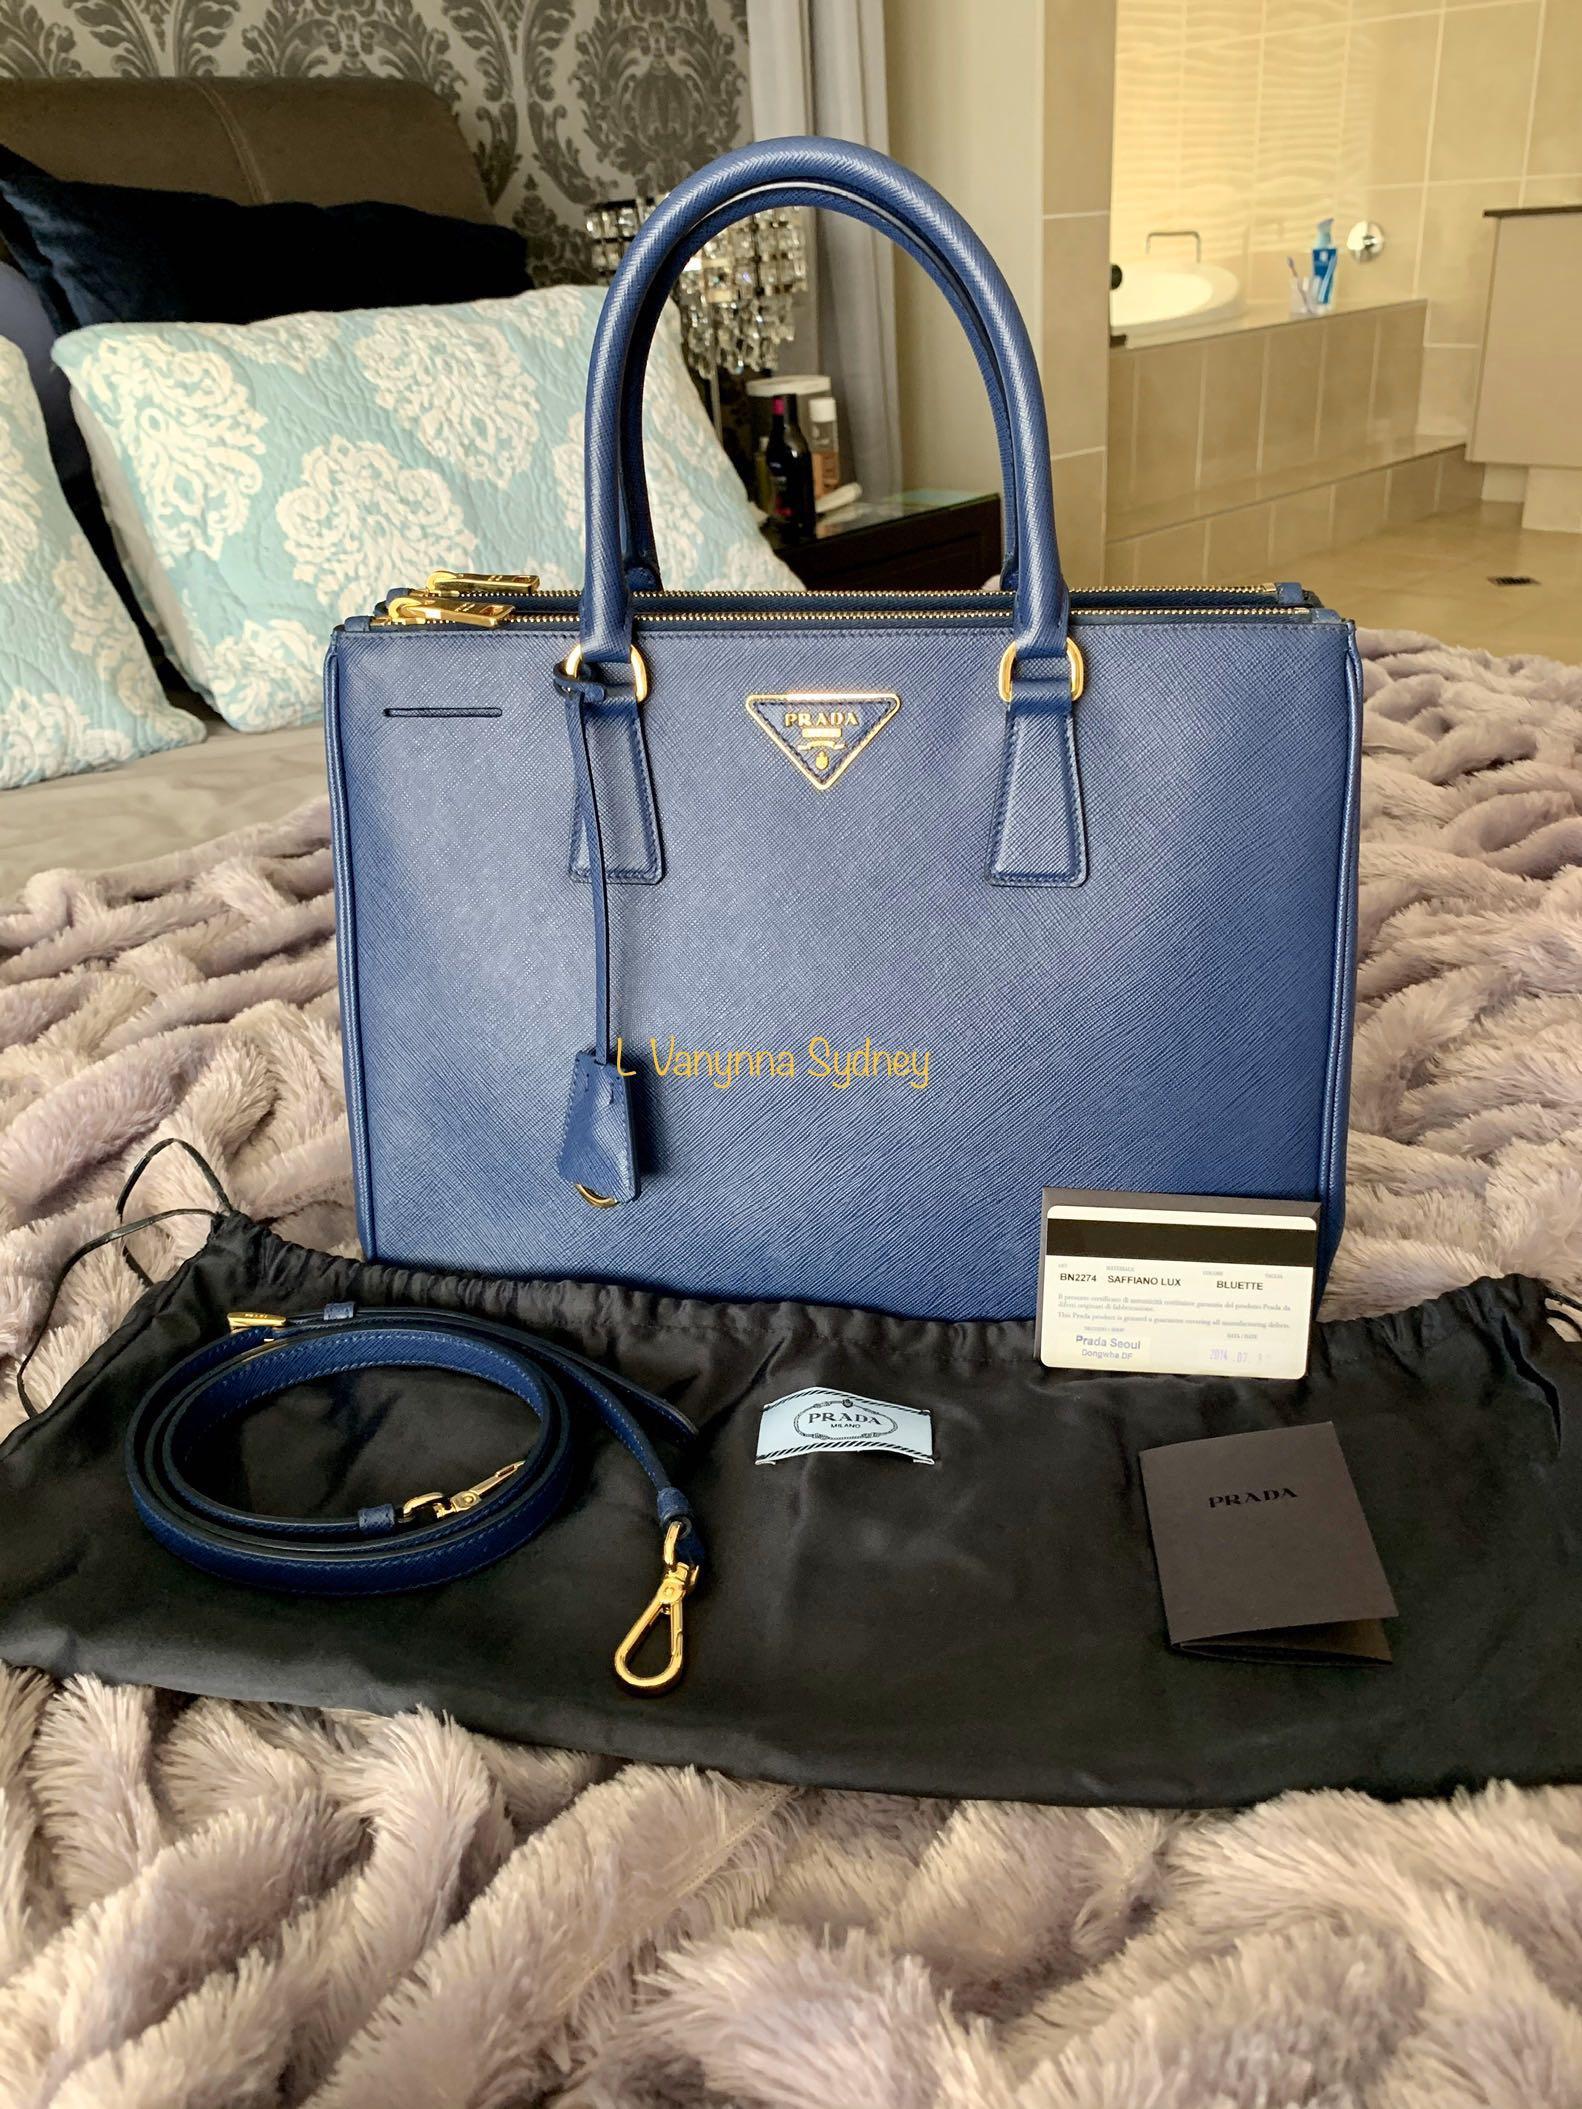 PRADA Bluette Saffiano Lux Leather Medium Tote BN2274 (Authentic) RRP $3,160